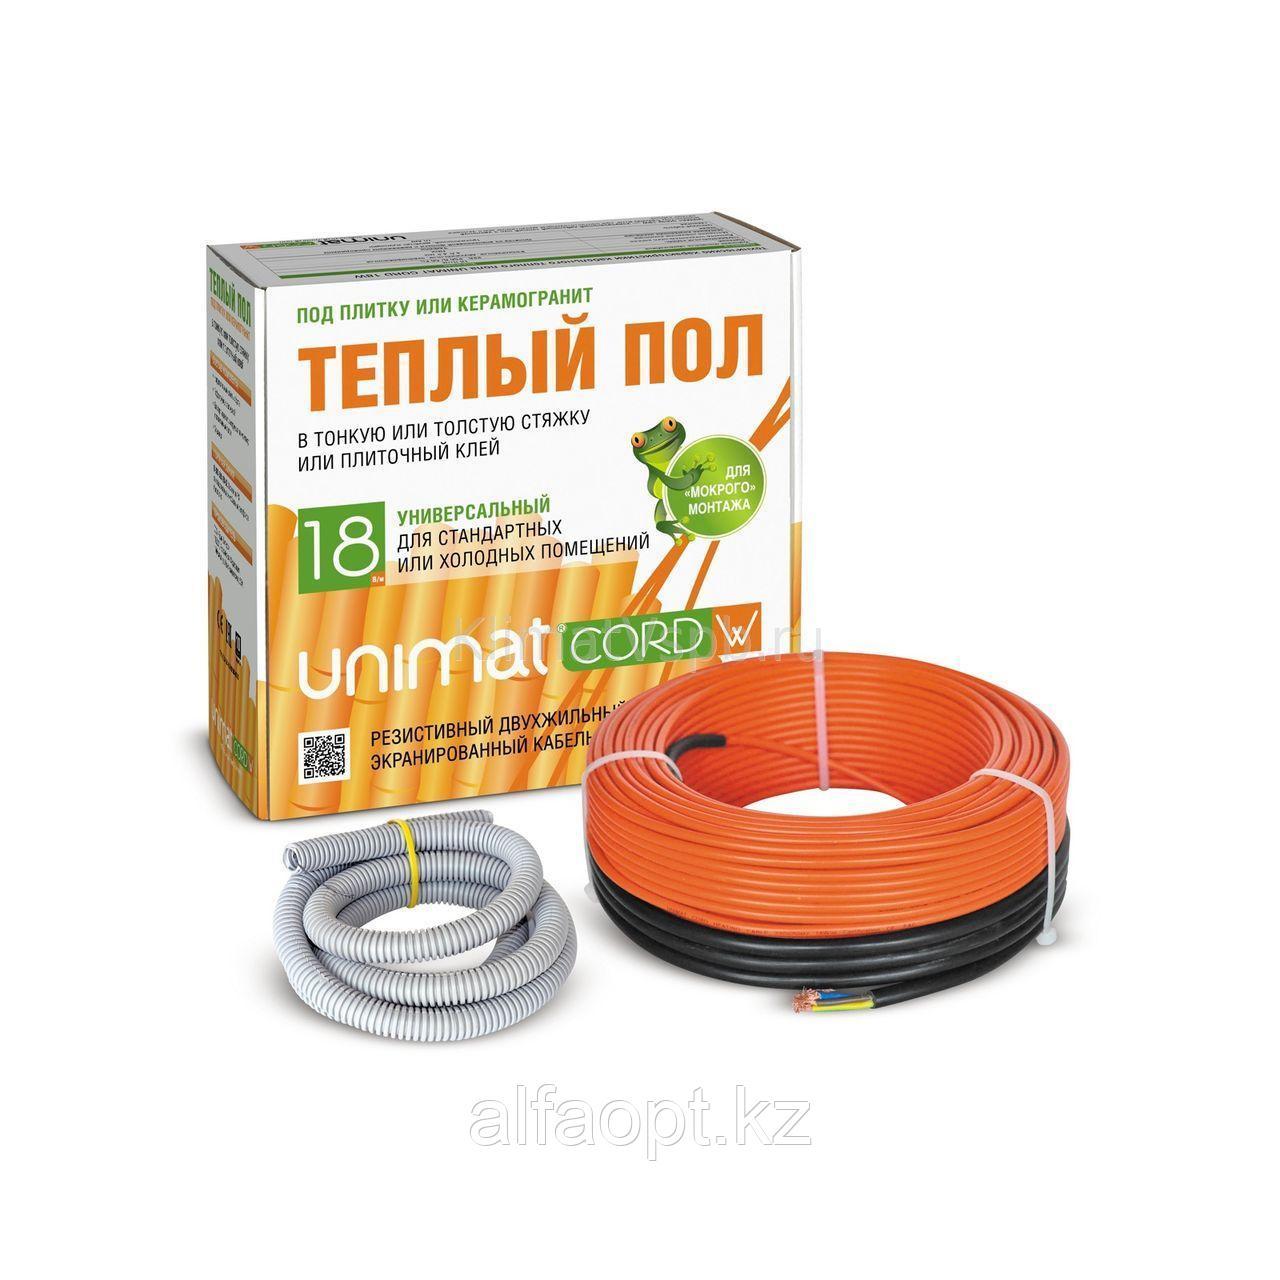 Комплект теплого пола Unimat CORD 18W-70